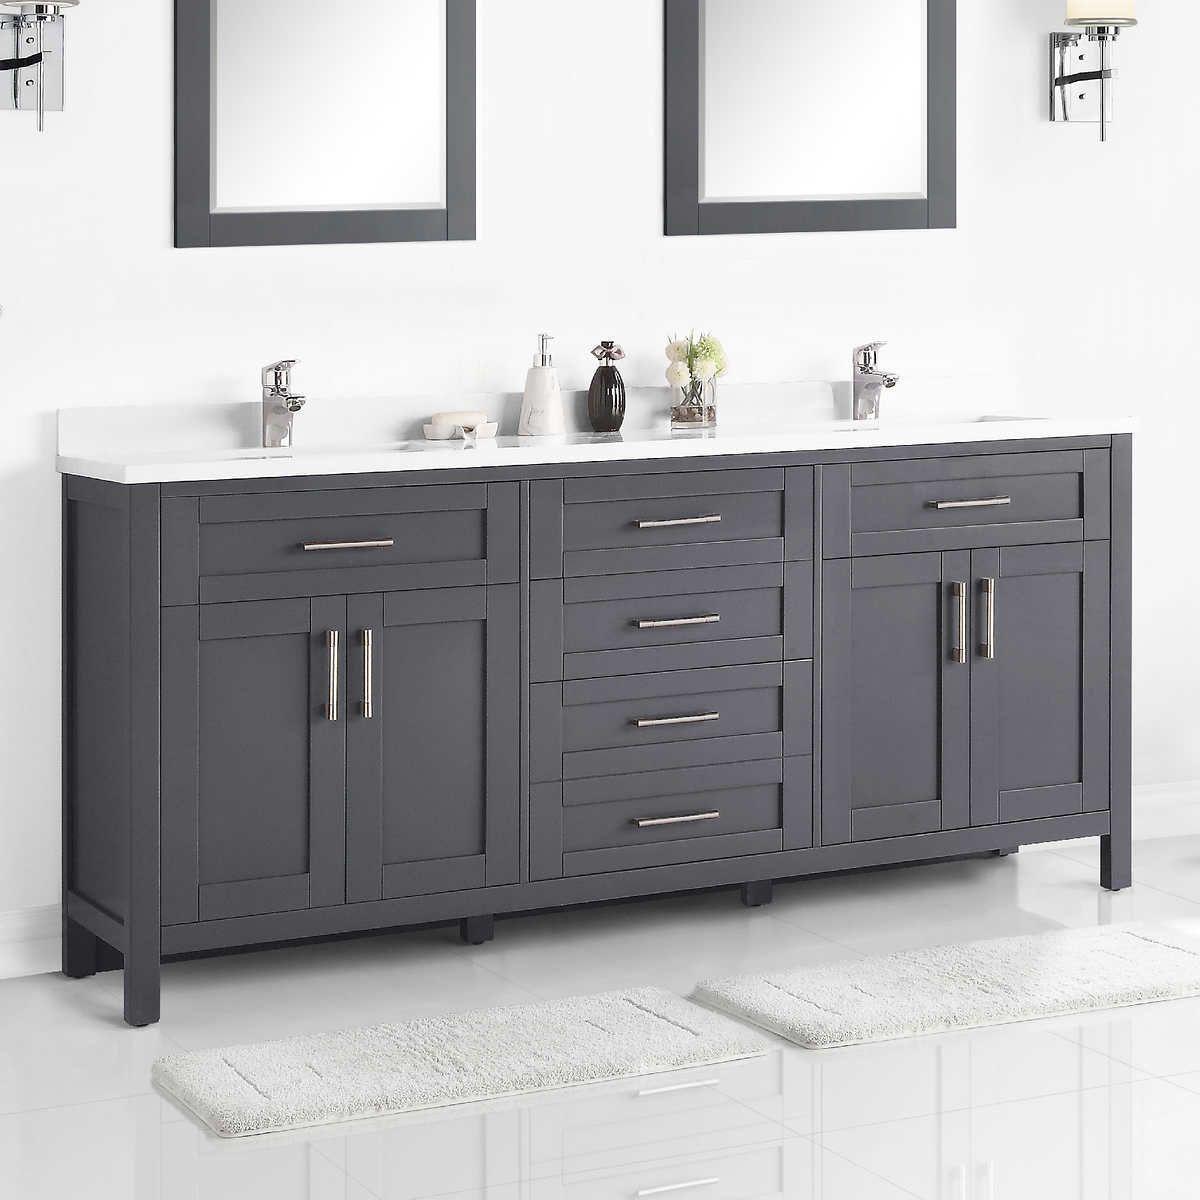 Ove Decors Lakeview 72 Vanity 72 Vanity Bathroom Interior Contemporary Bathroom Designs